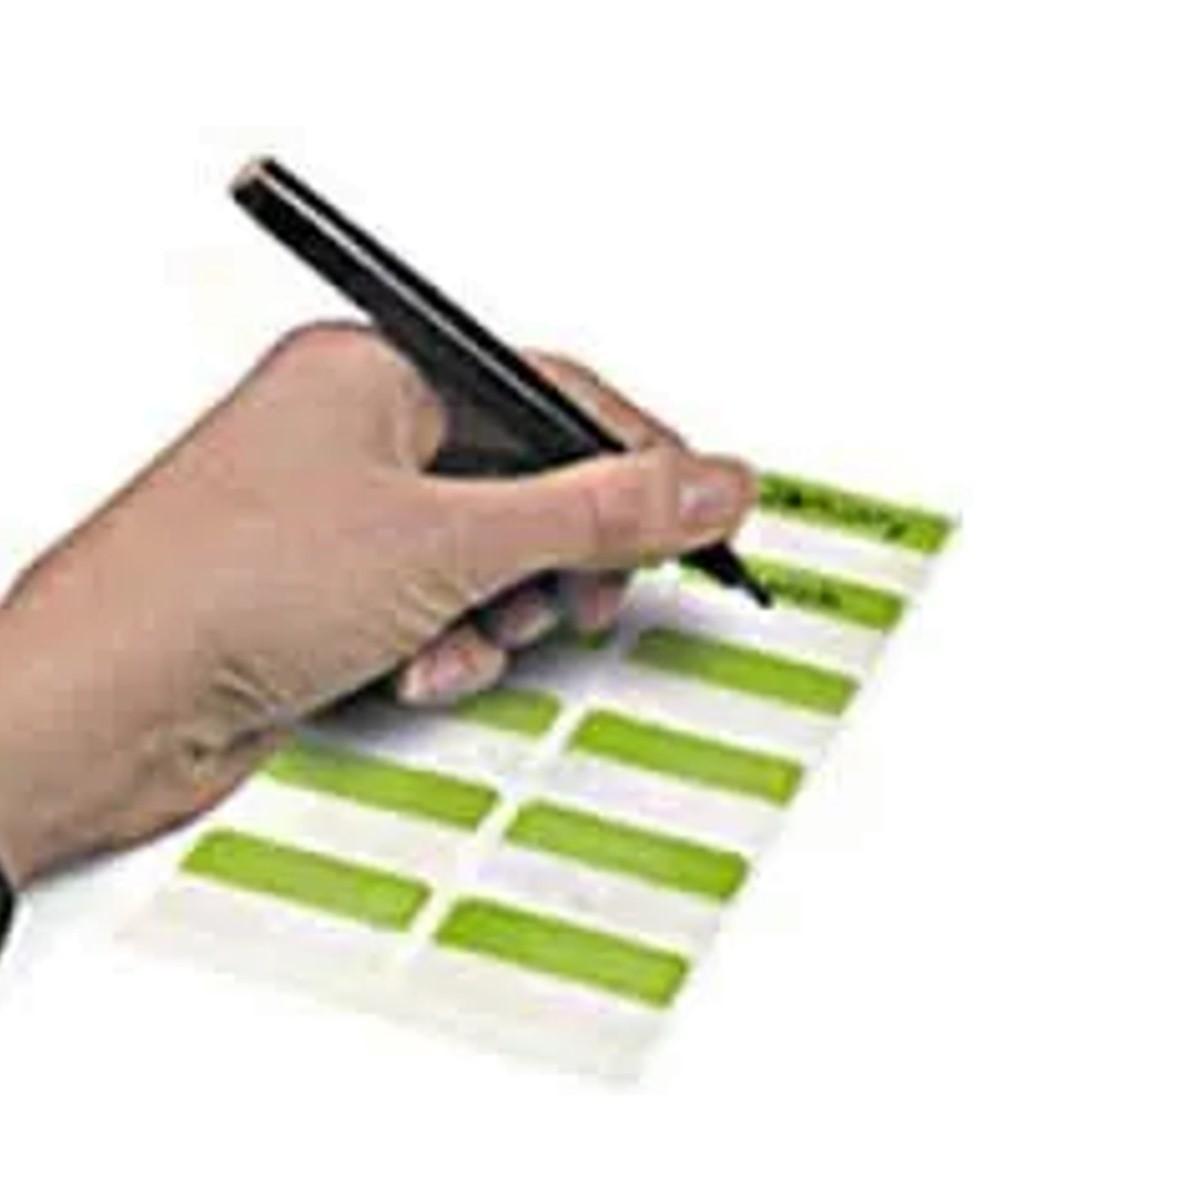 Marcador Páginas Index Tabs Impresso Branco A - Z Caixa com 10 Blisters